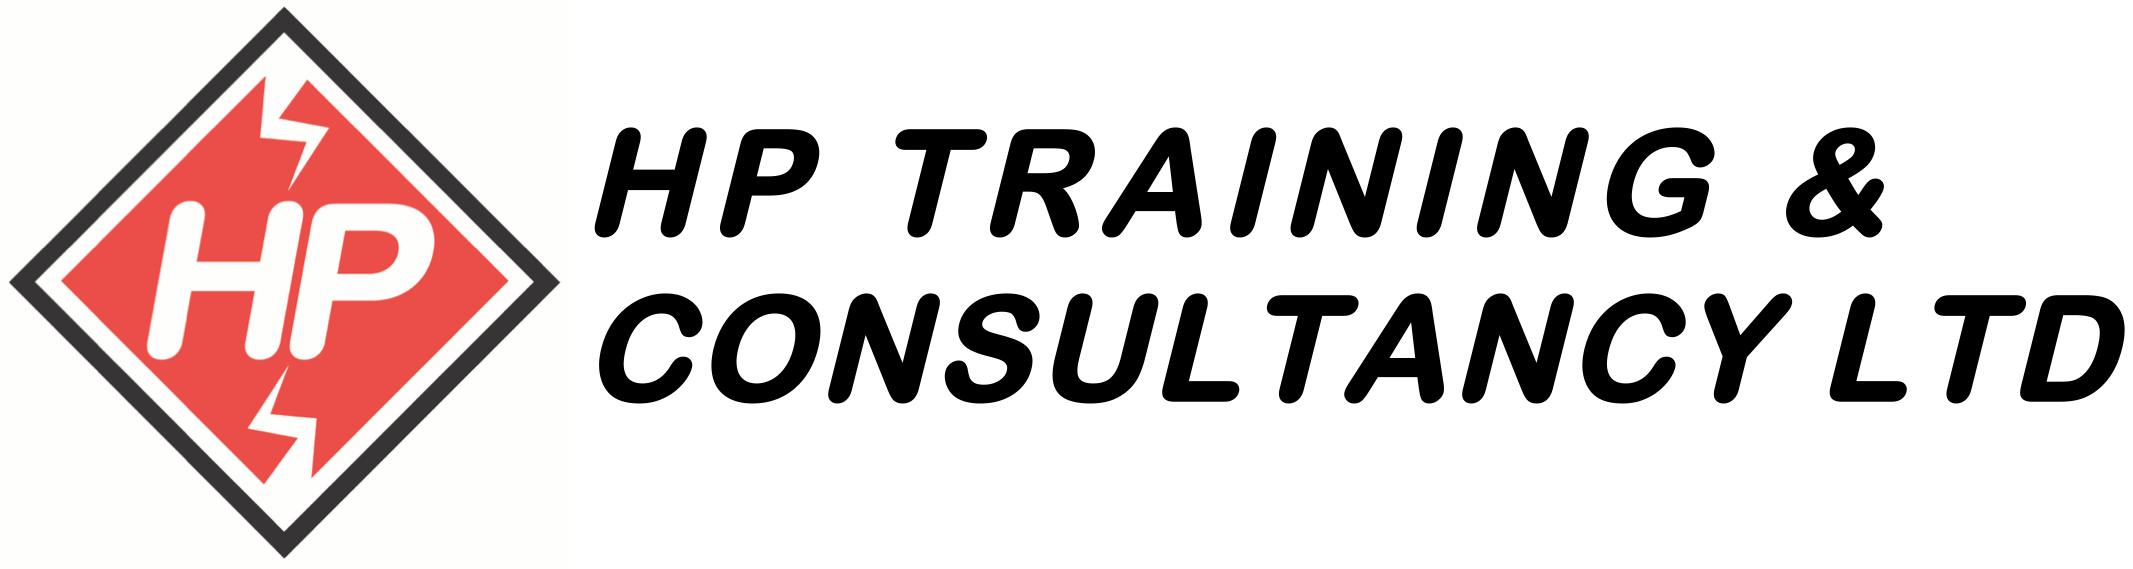 HP Training & Consultancy Ltd Logo